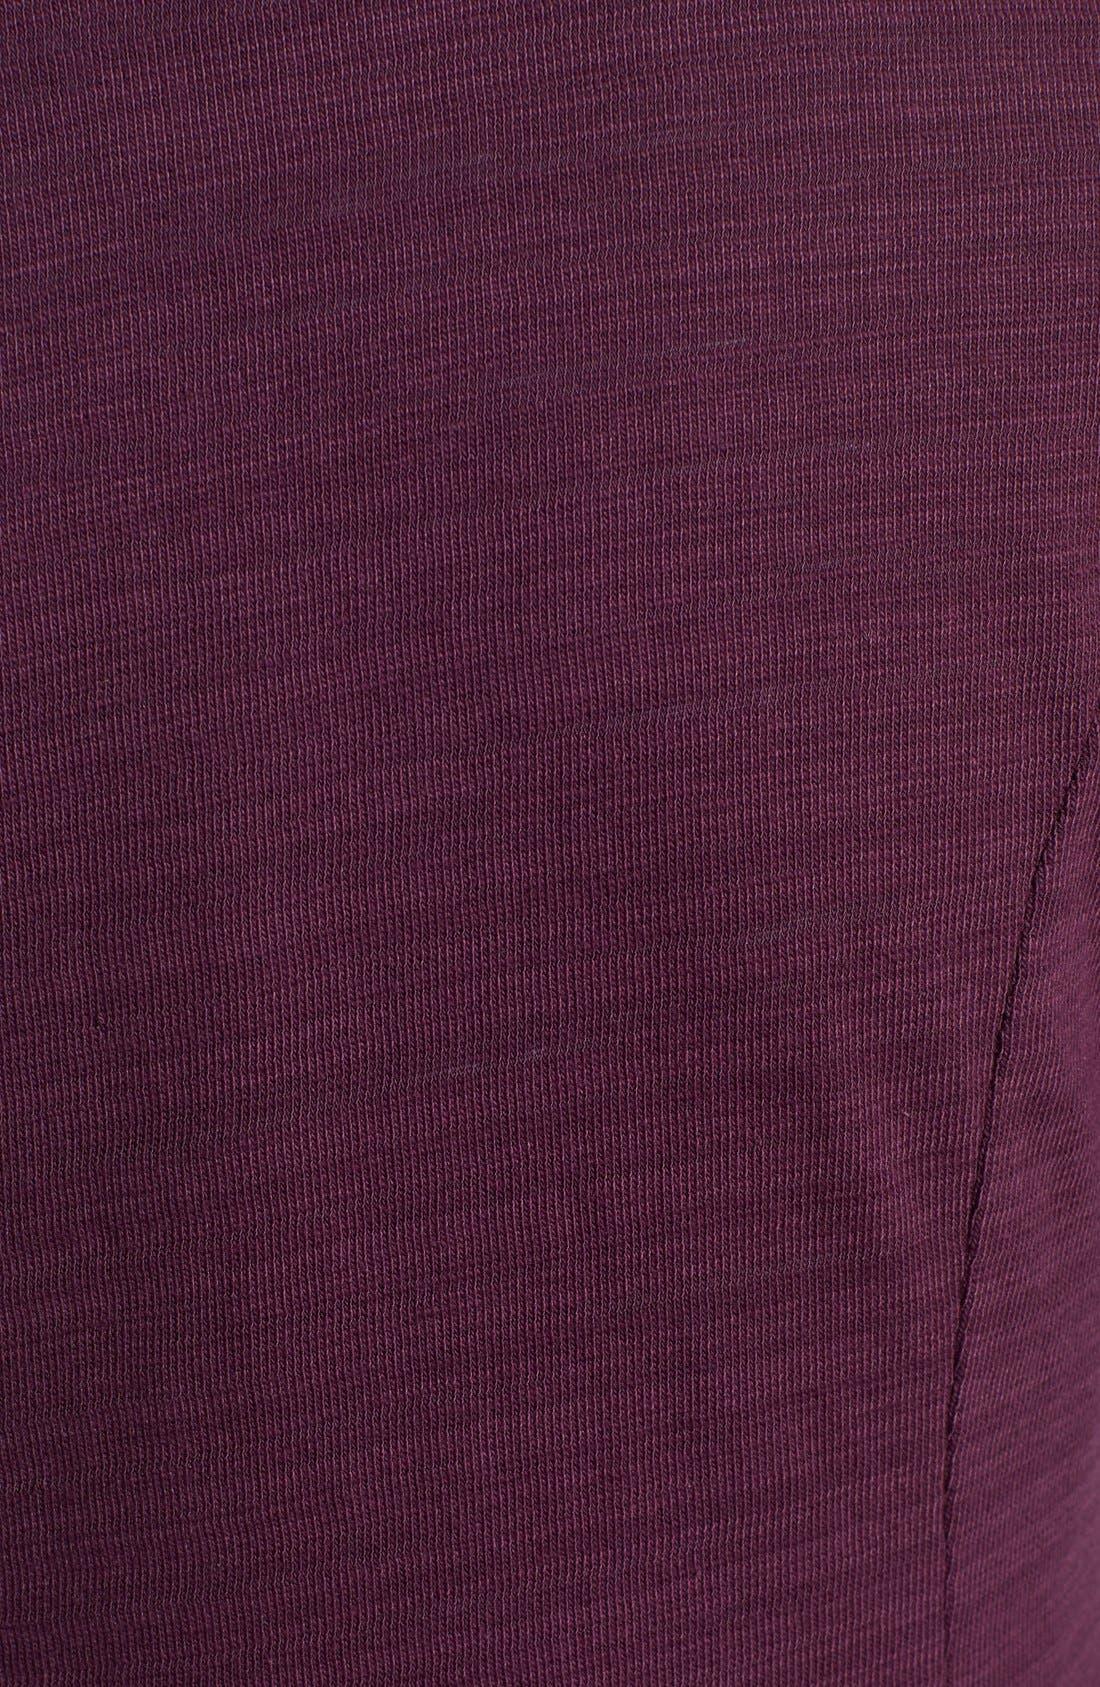 Knit One-Button Blazer,                             Alternate thumbnail 55, color,